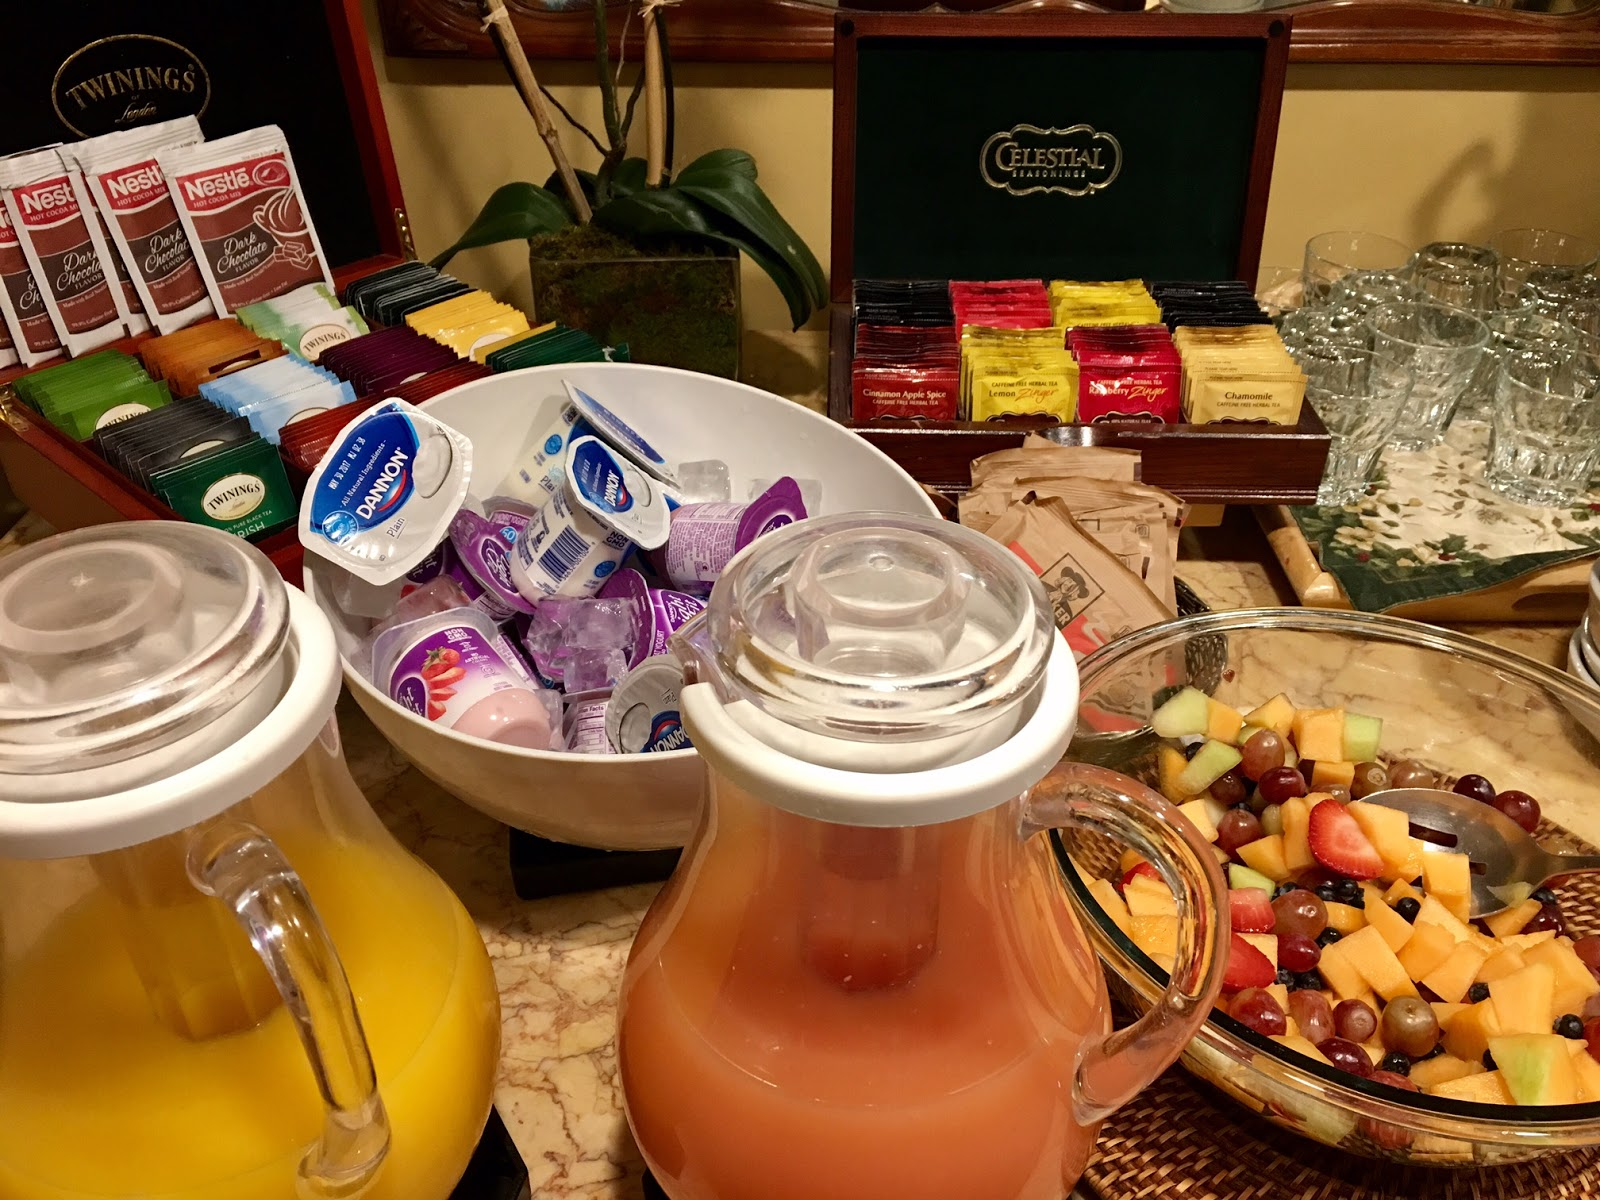 Hotel Elysee Complimentary Breakfast